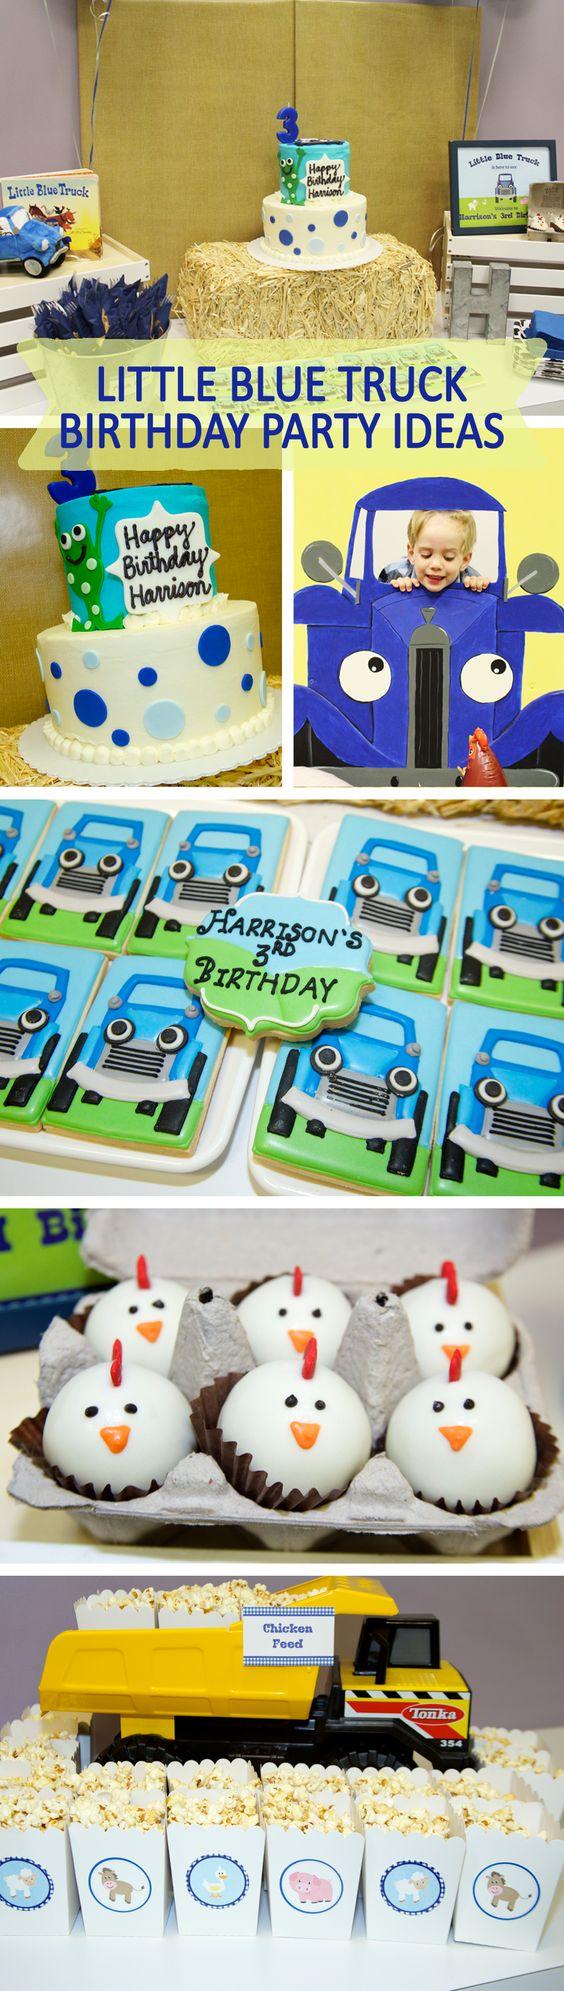 Little blue truck brithday party ideas, Little blue truck birthday theme party…